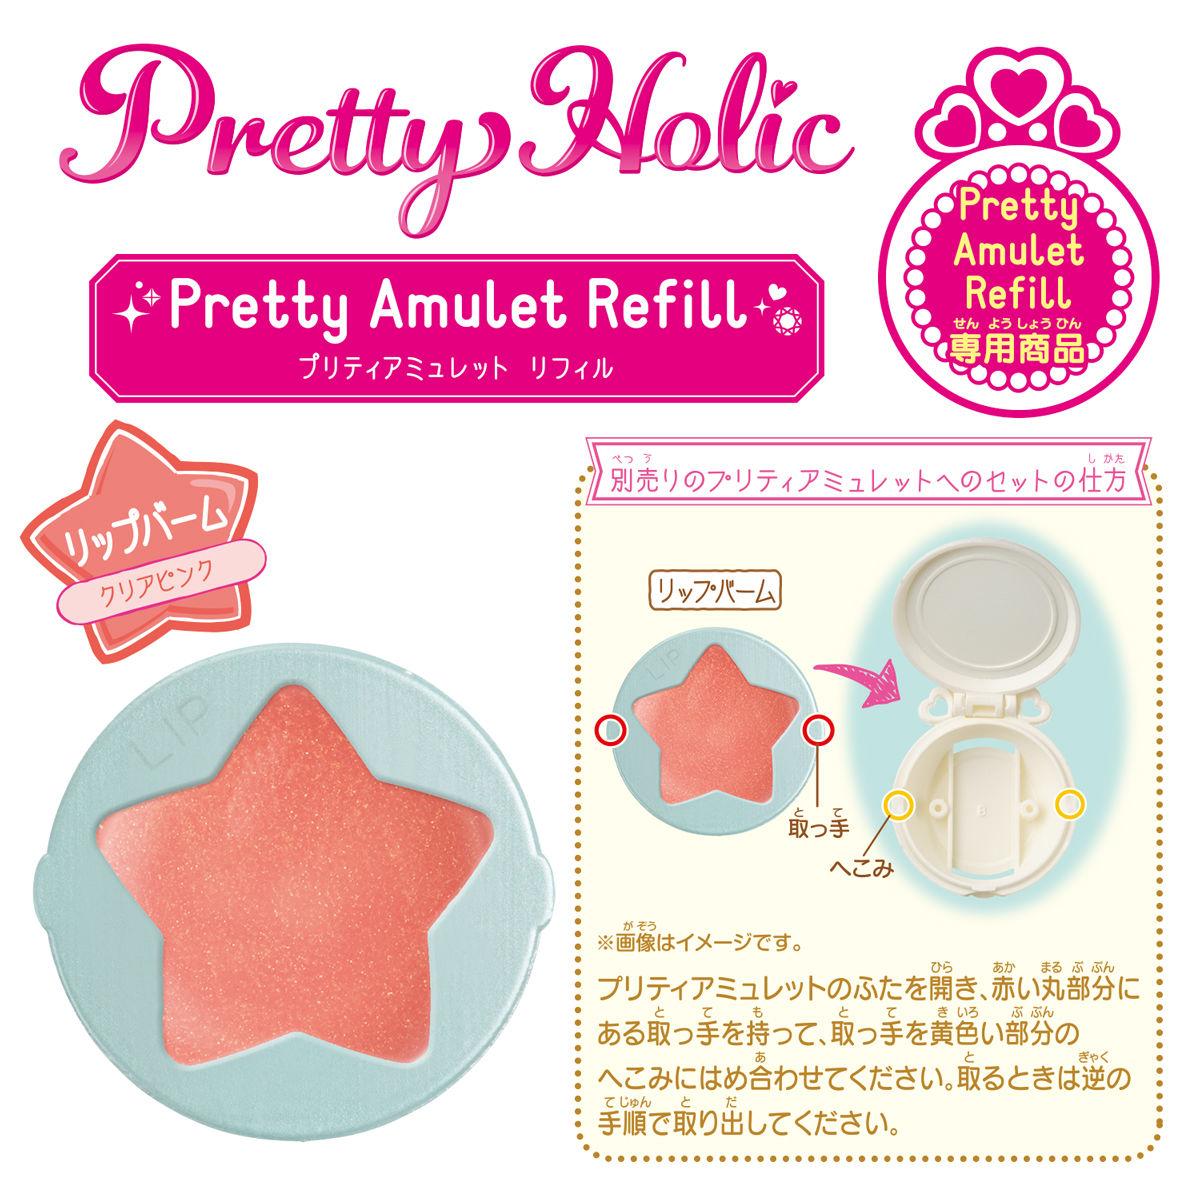 Pretty Holic プリティアミュレットリフィル リップバーム(クリアピンク)